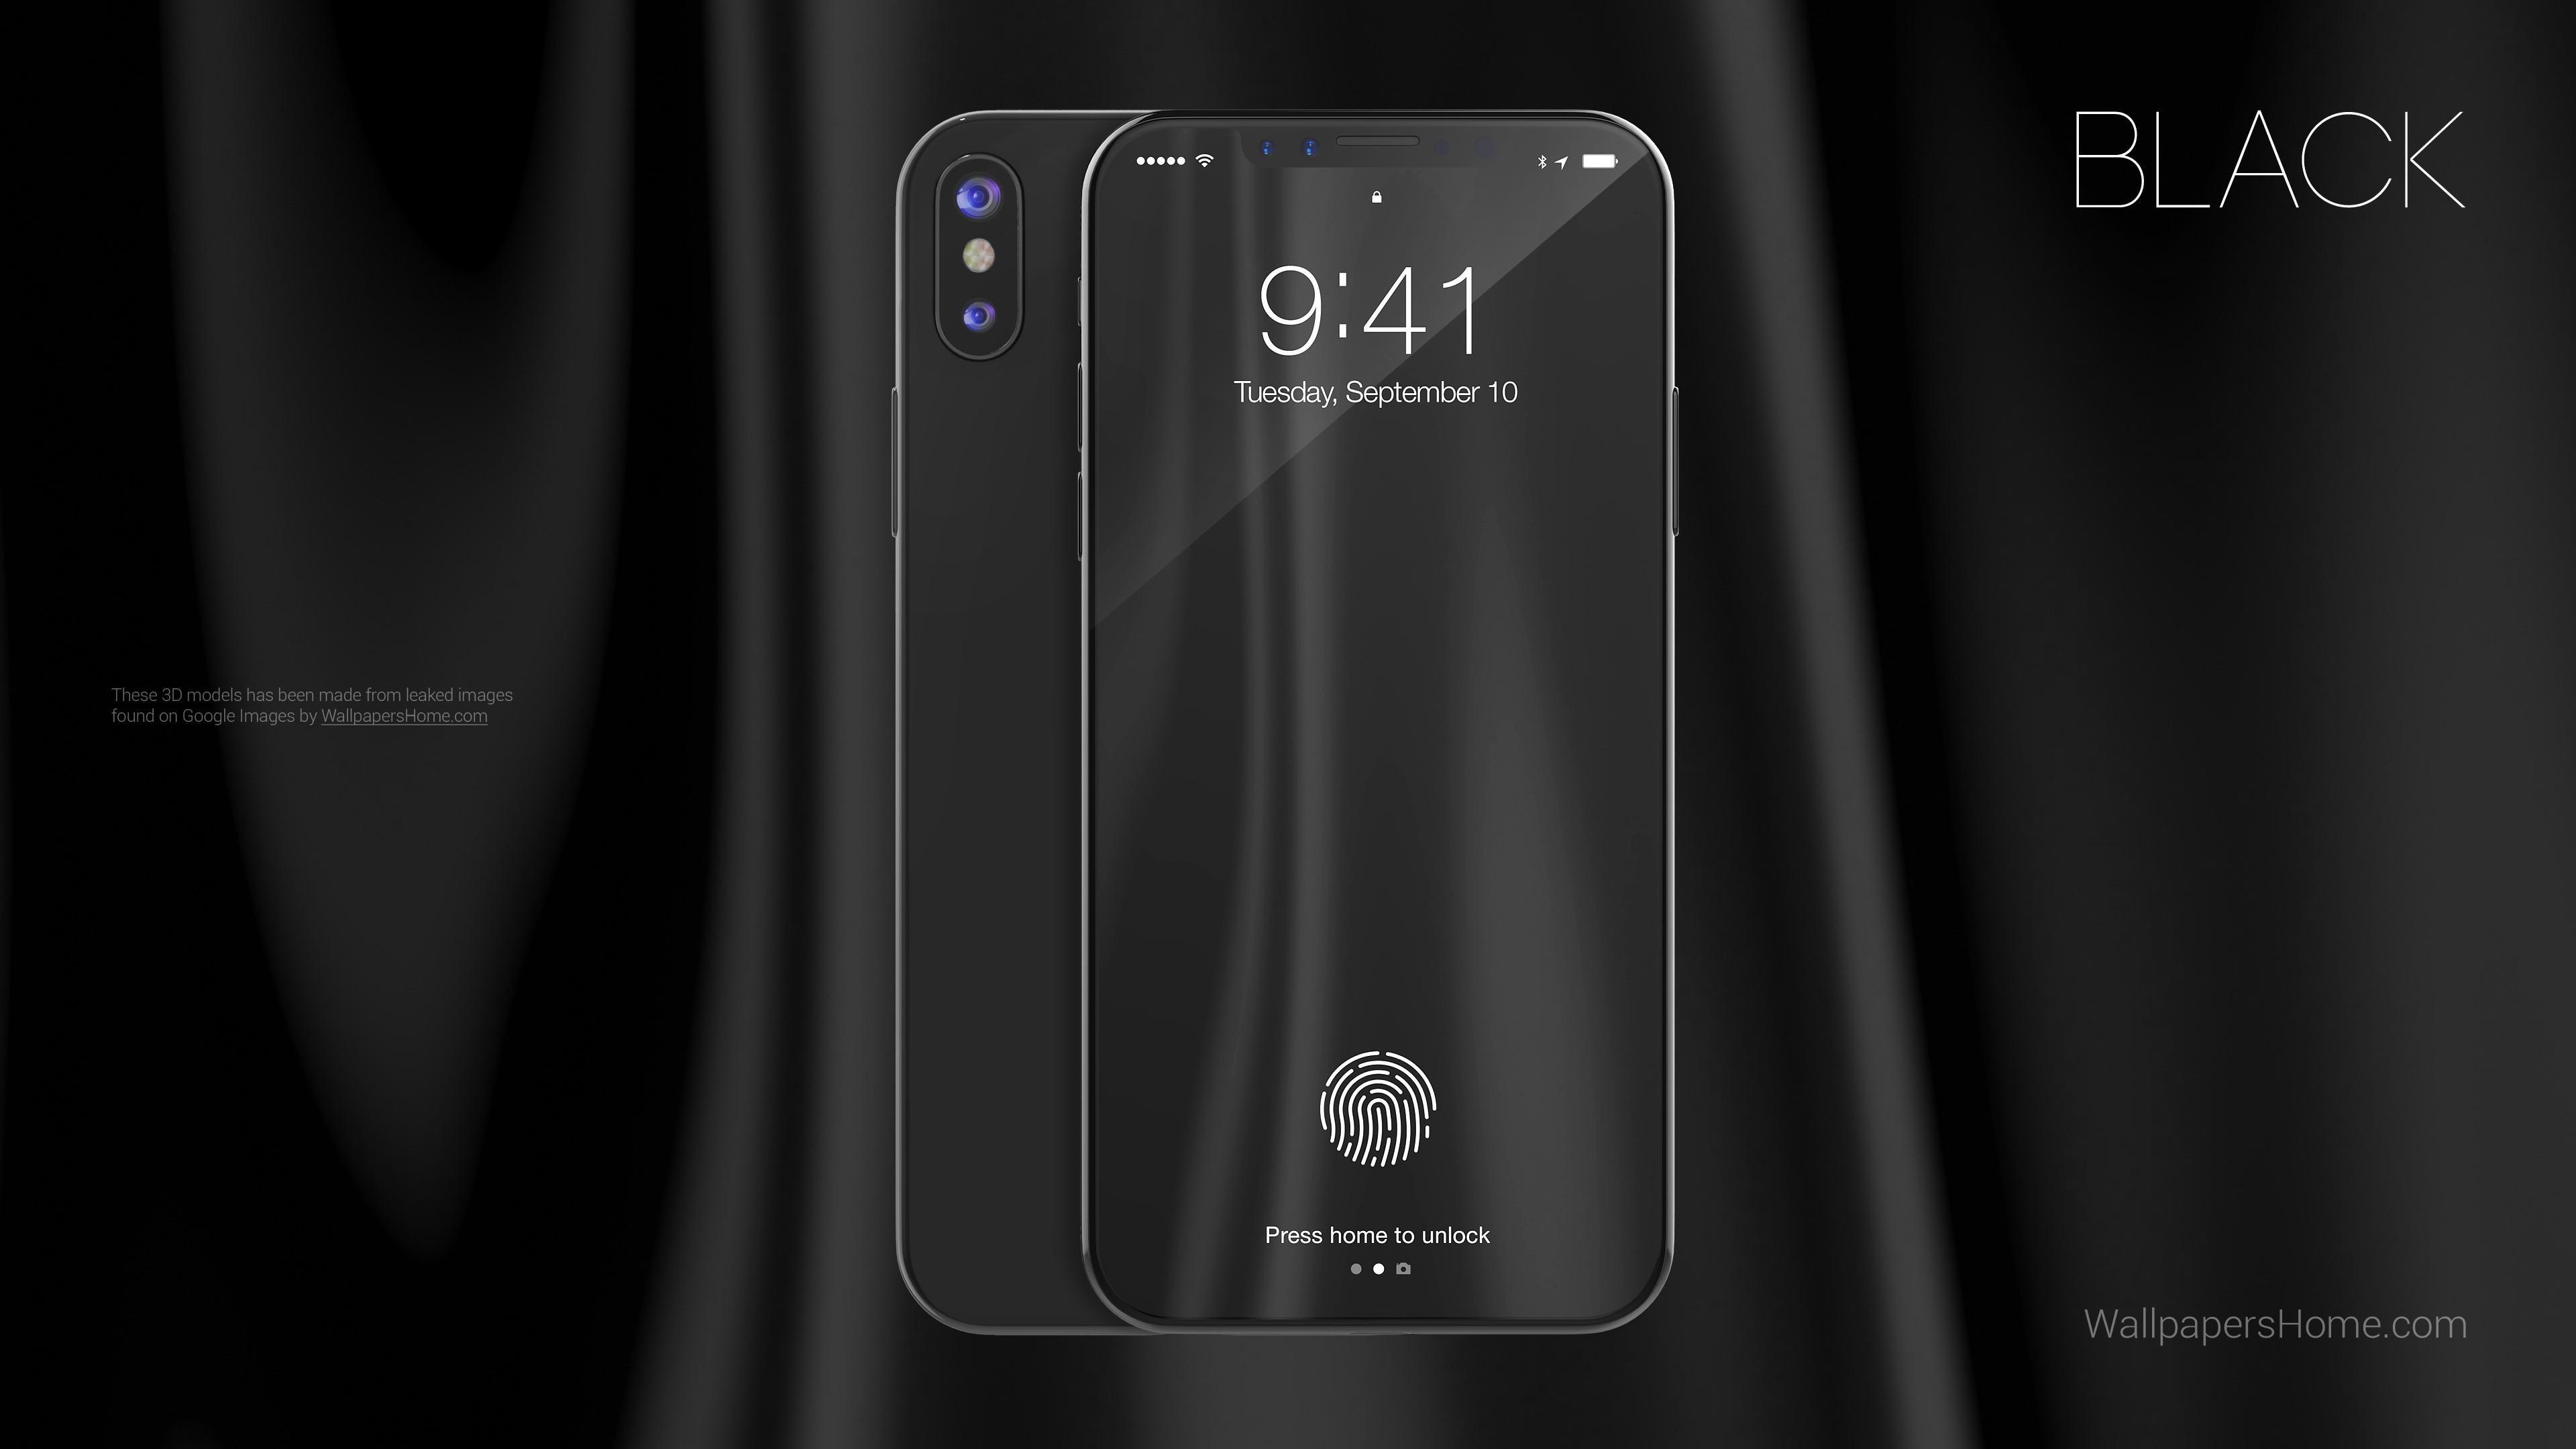 Iphone X Iphone 10 Hd Wallpapers: Wallpaper IPhone X, Black, 3D, Leaked, WWDC 2017, 4k, Hi